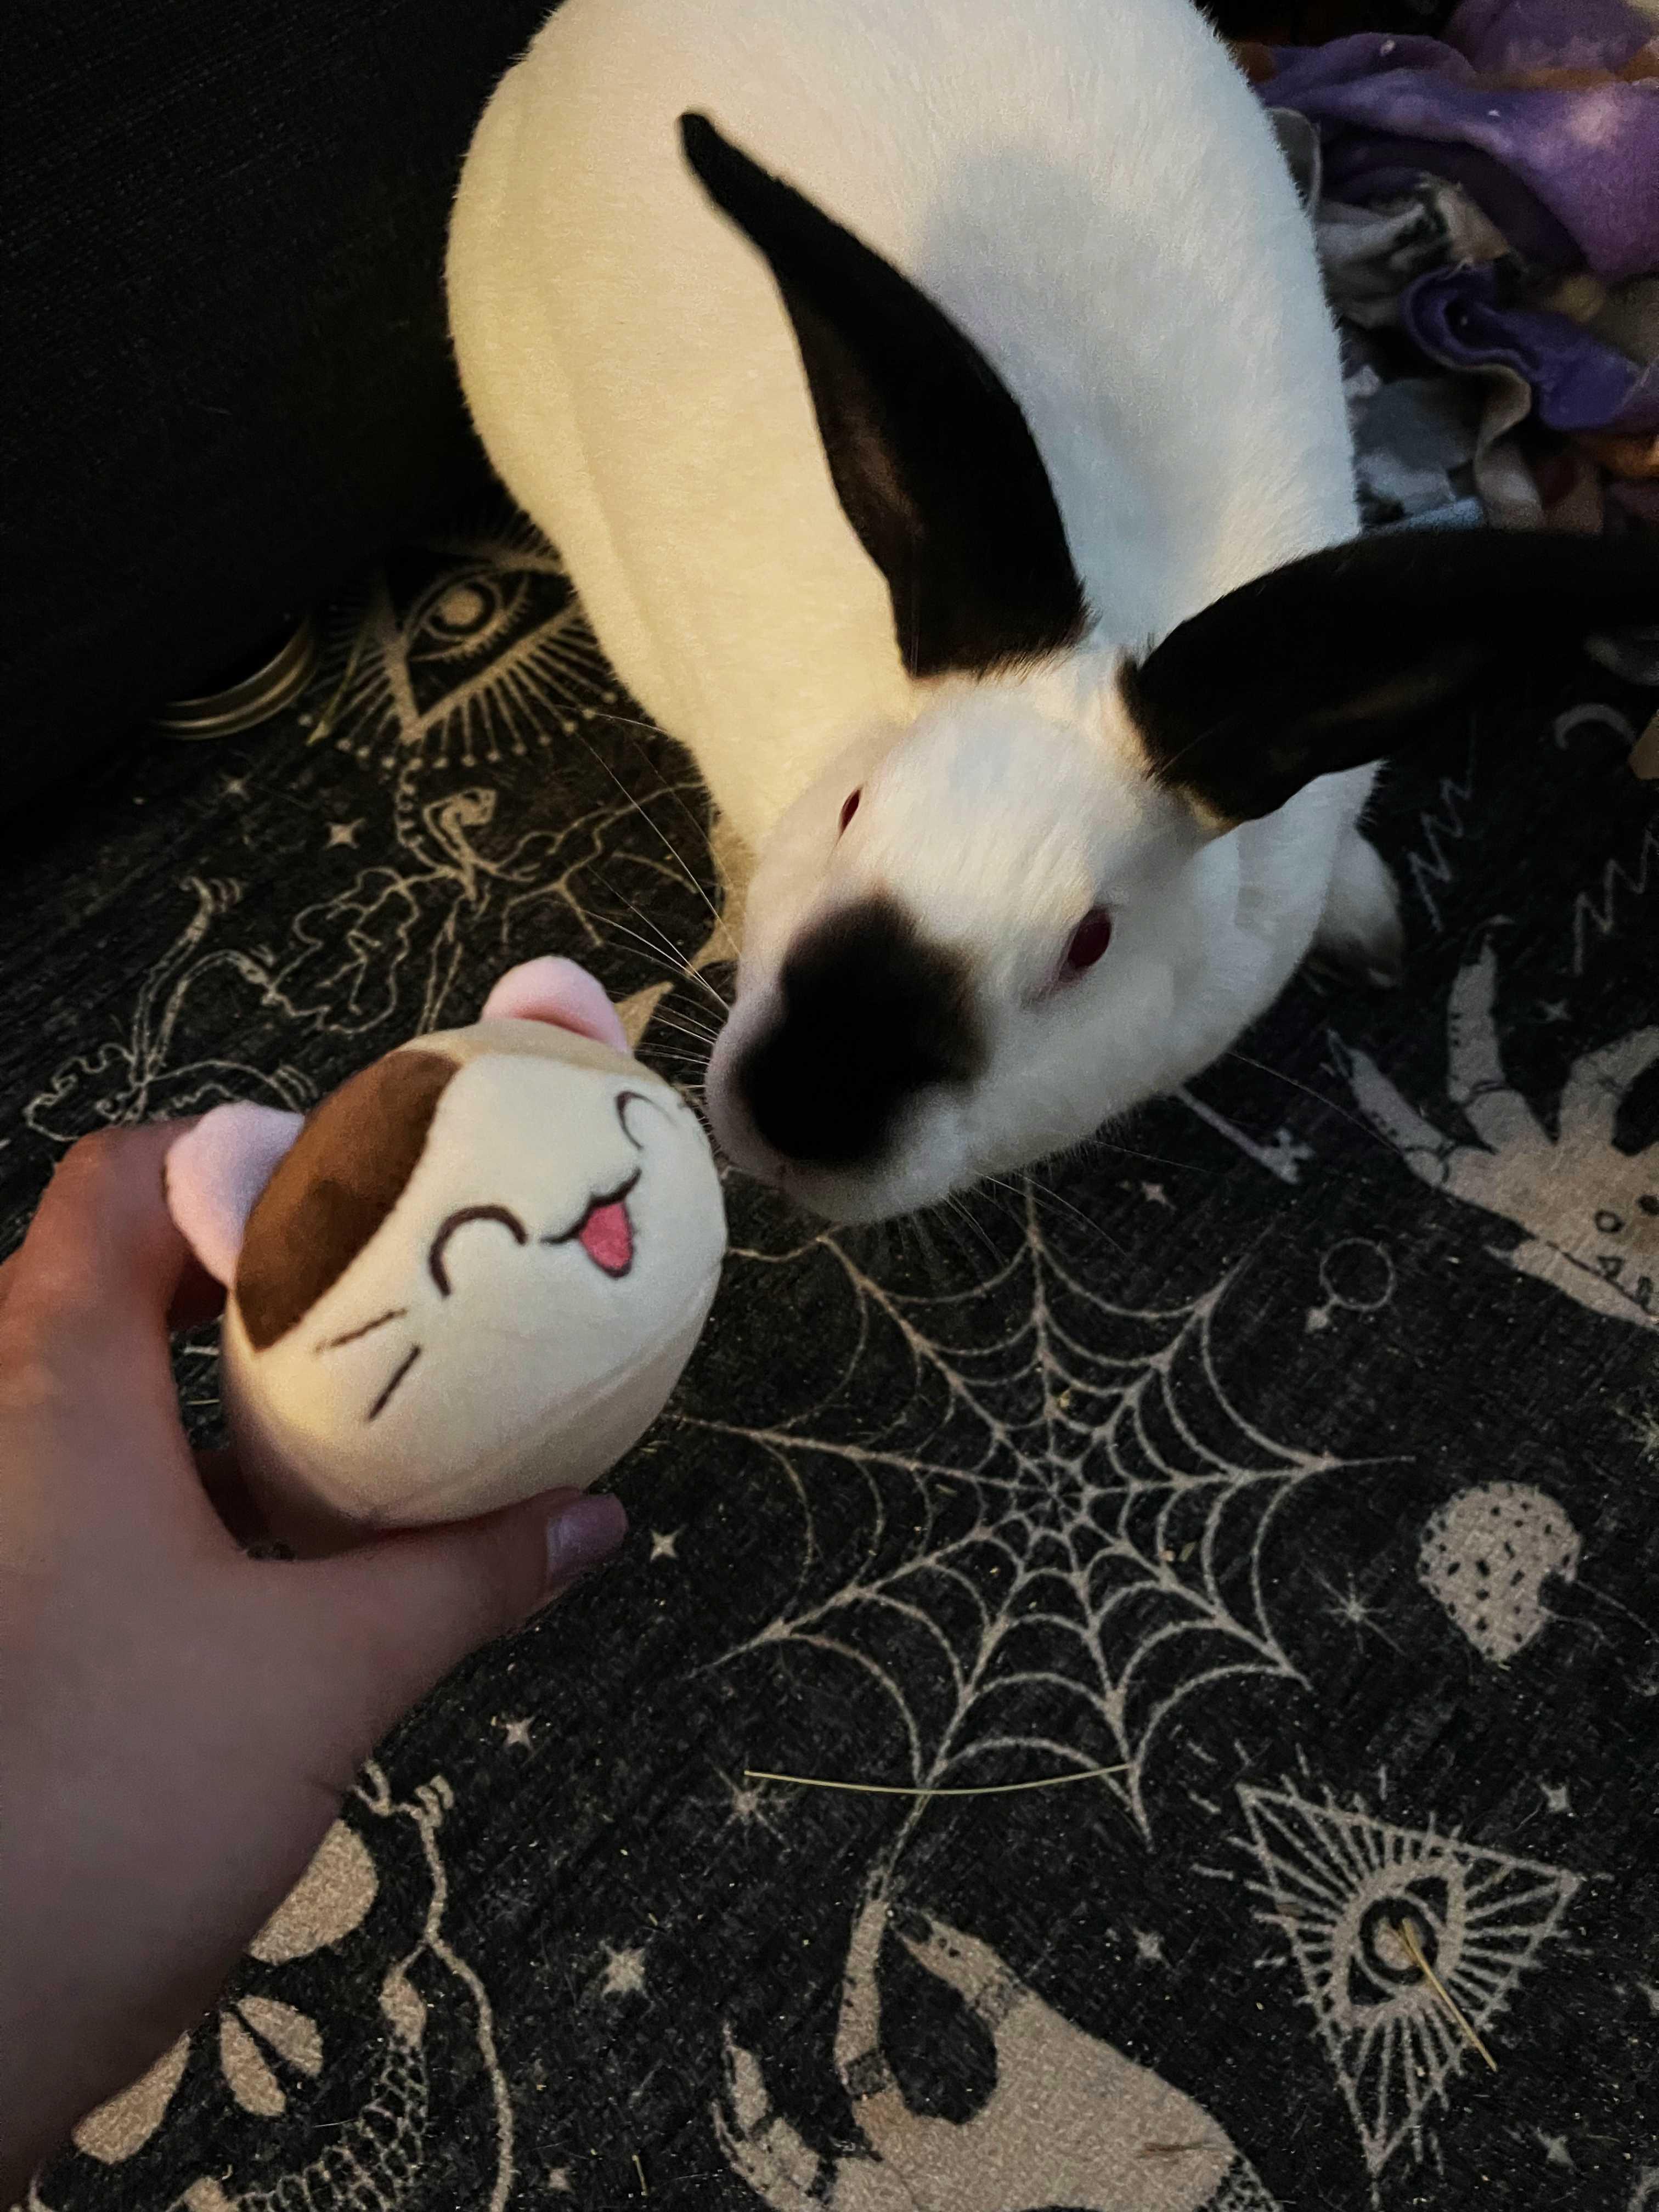 Just my bunny Sabrina being super cute